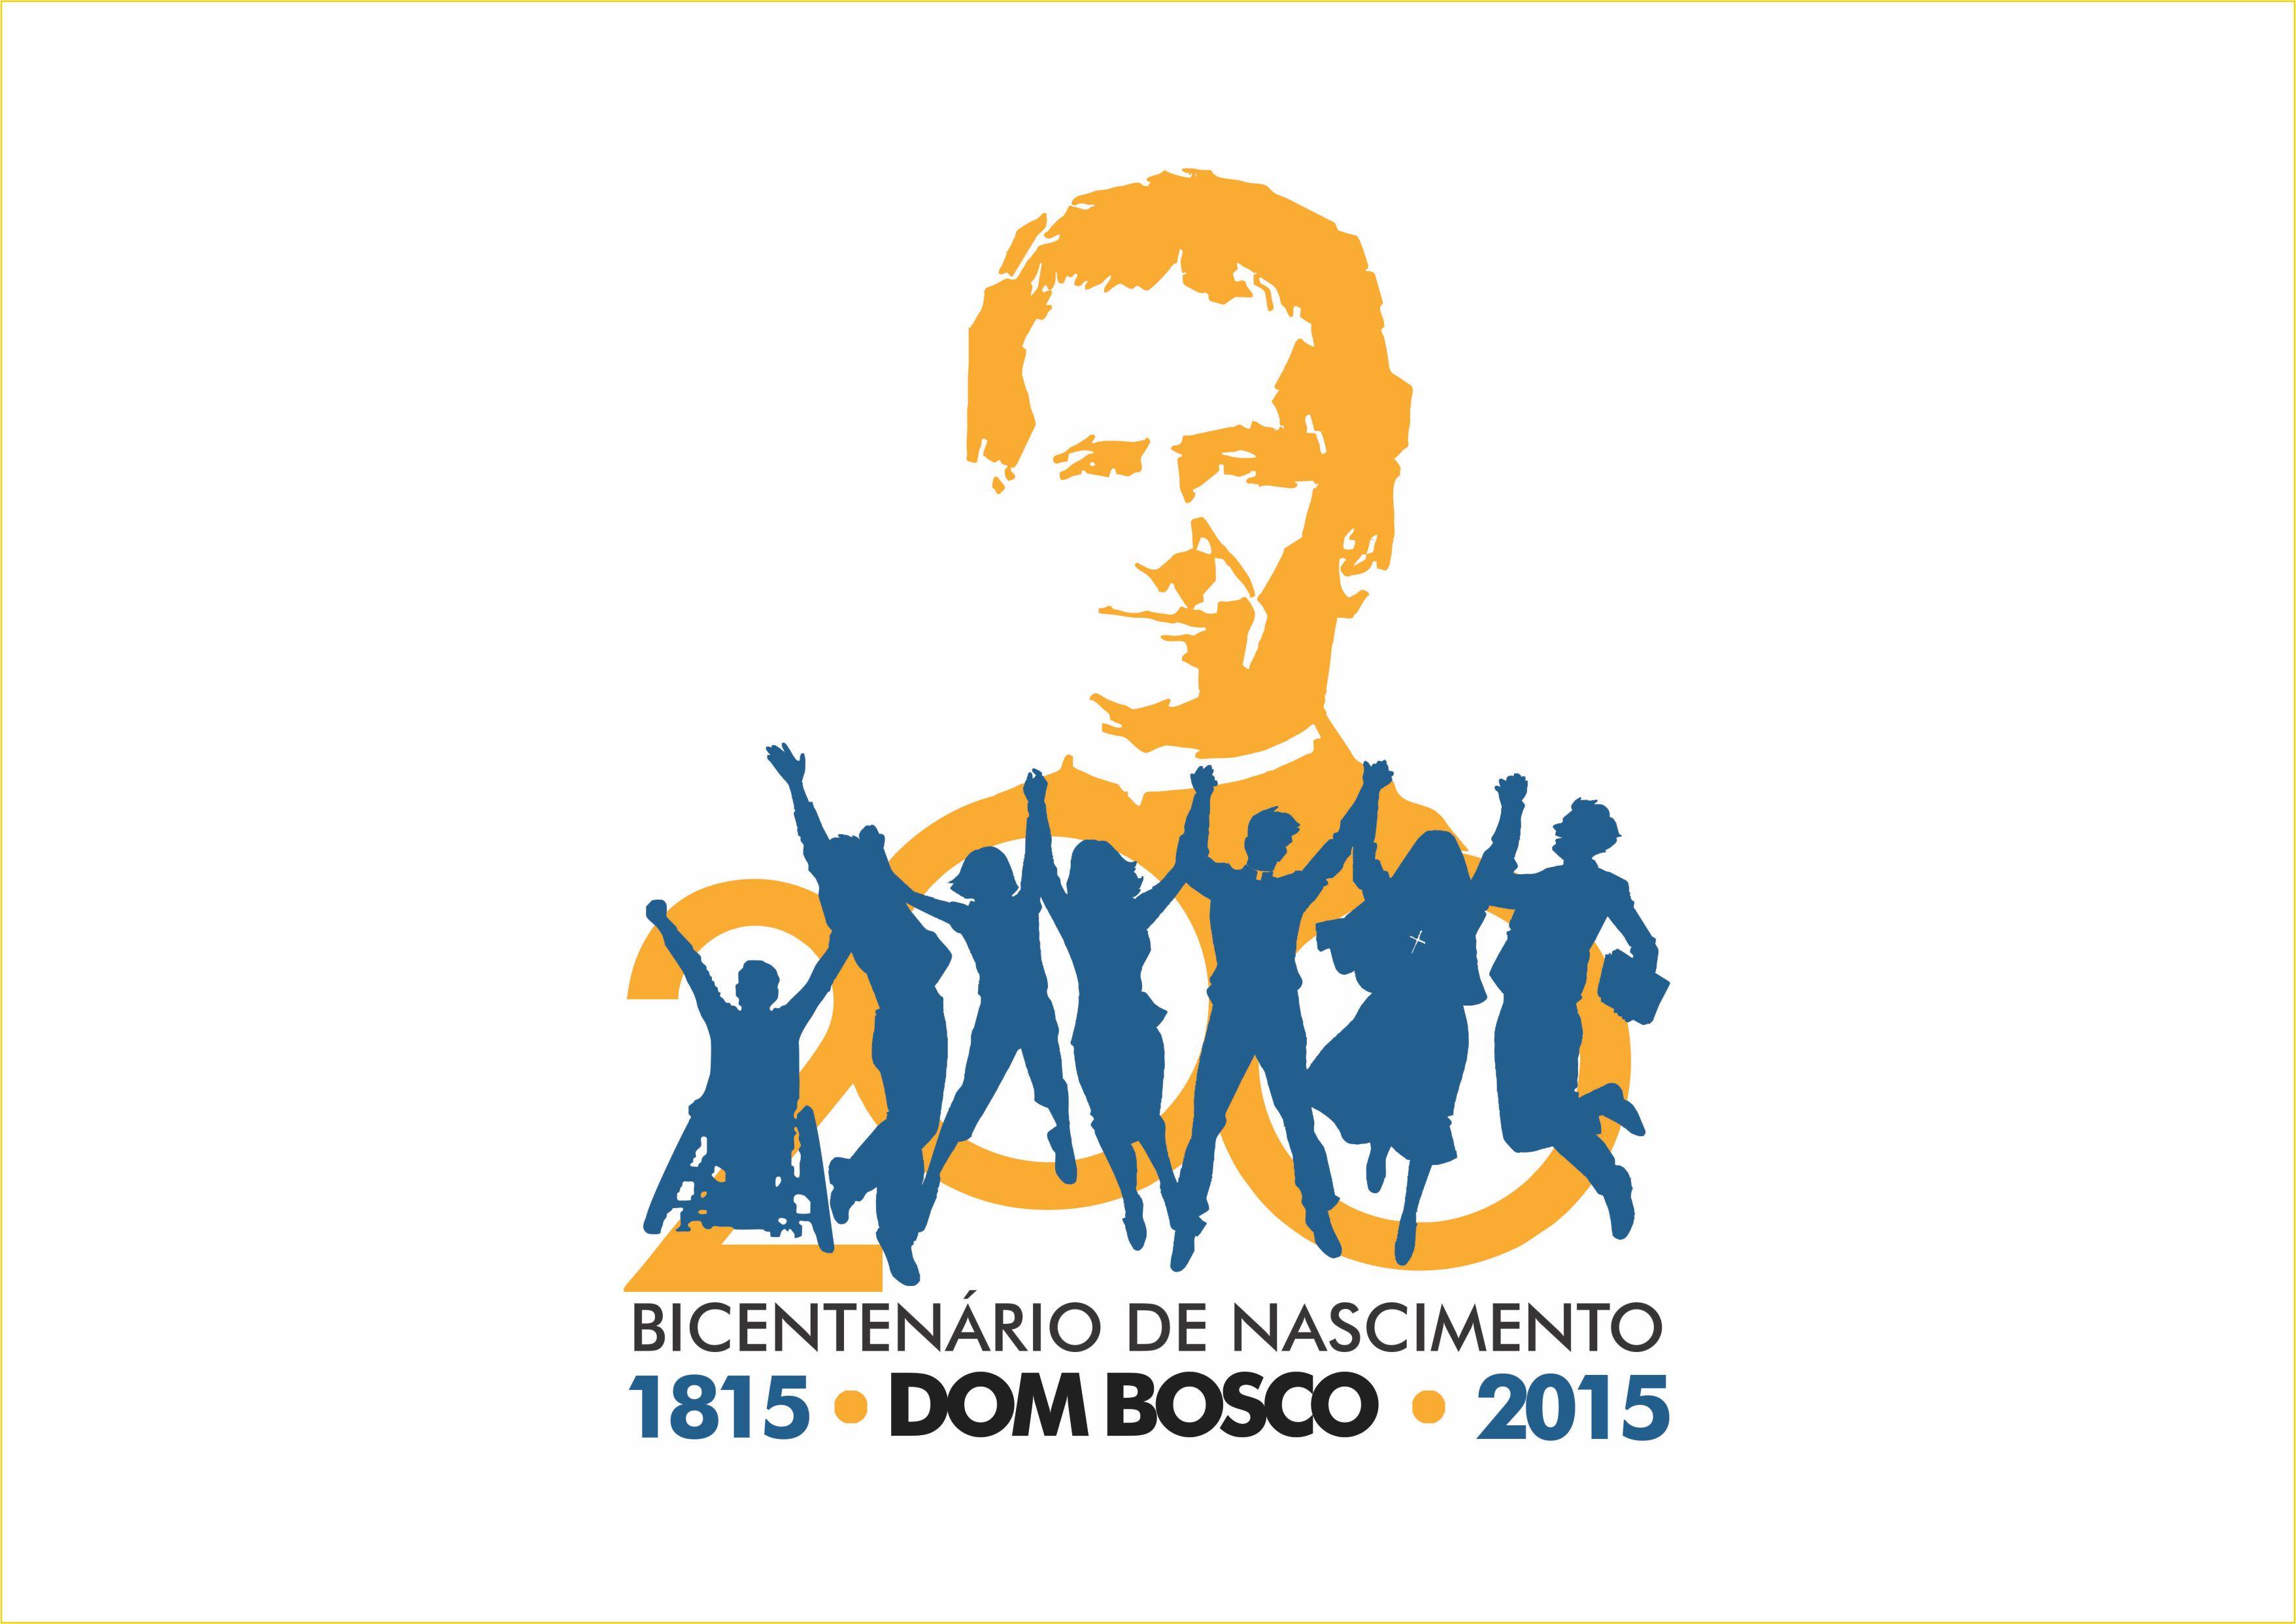 Bicenten_rio-site